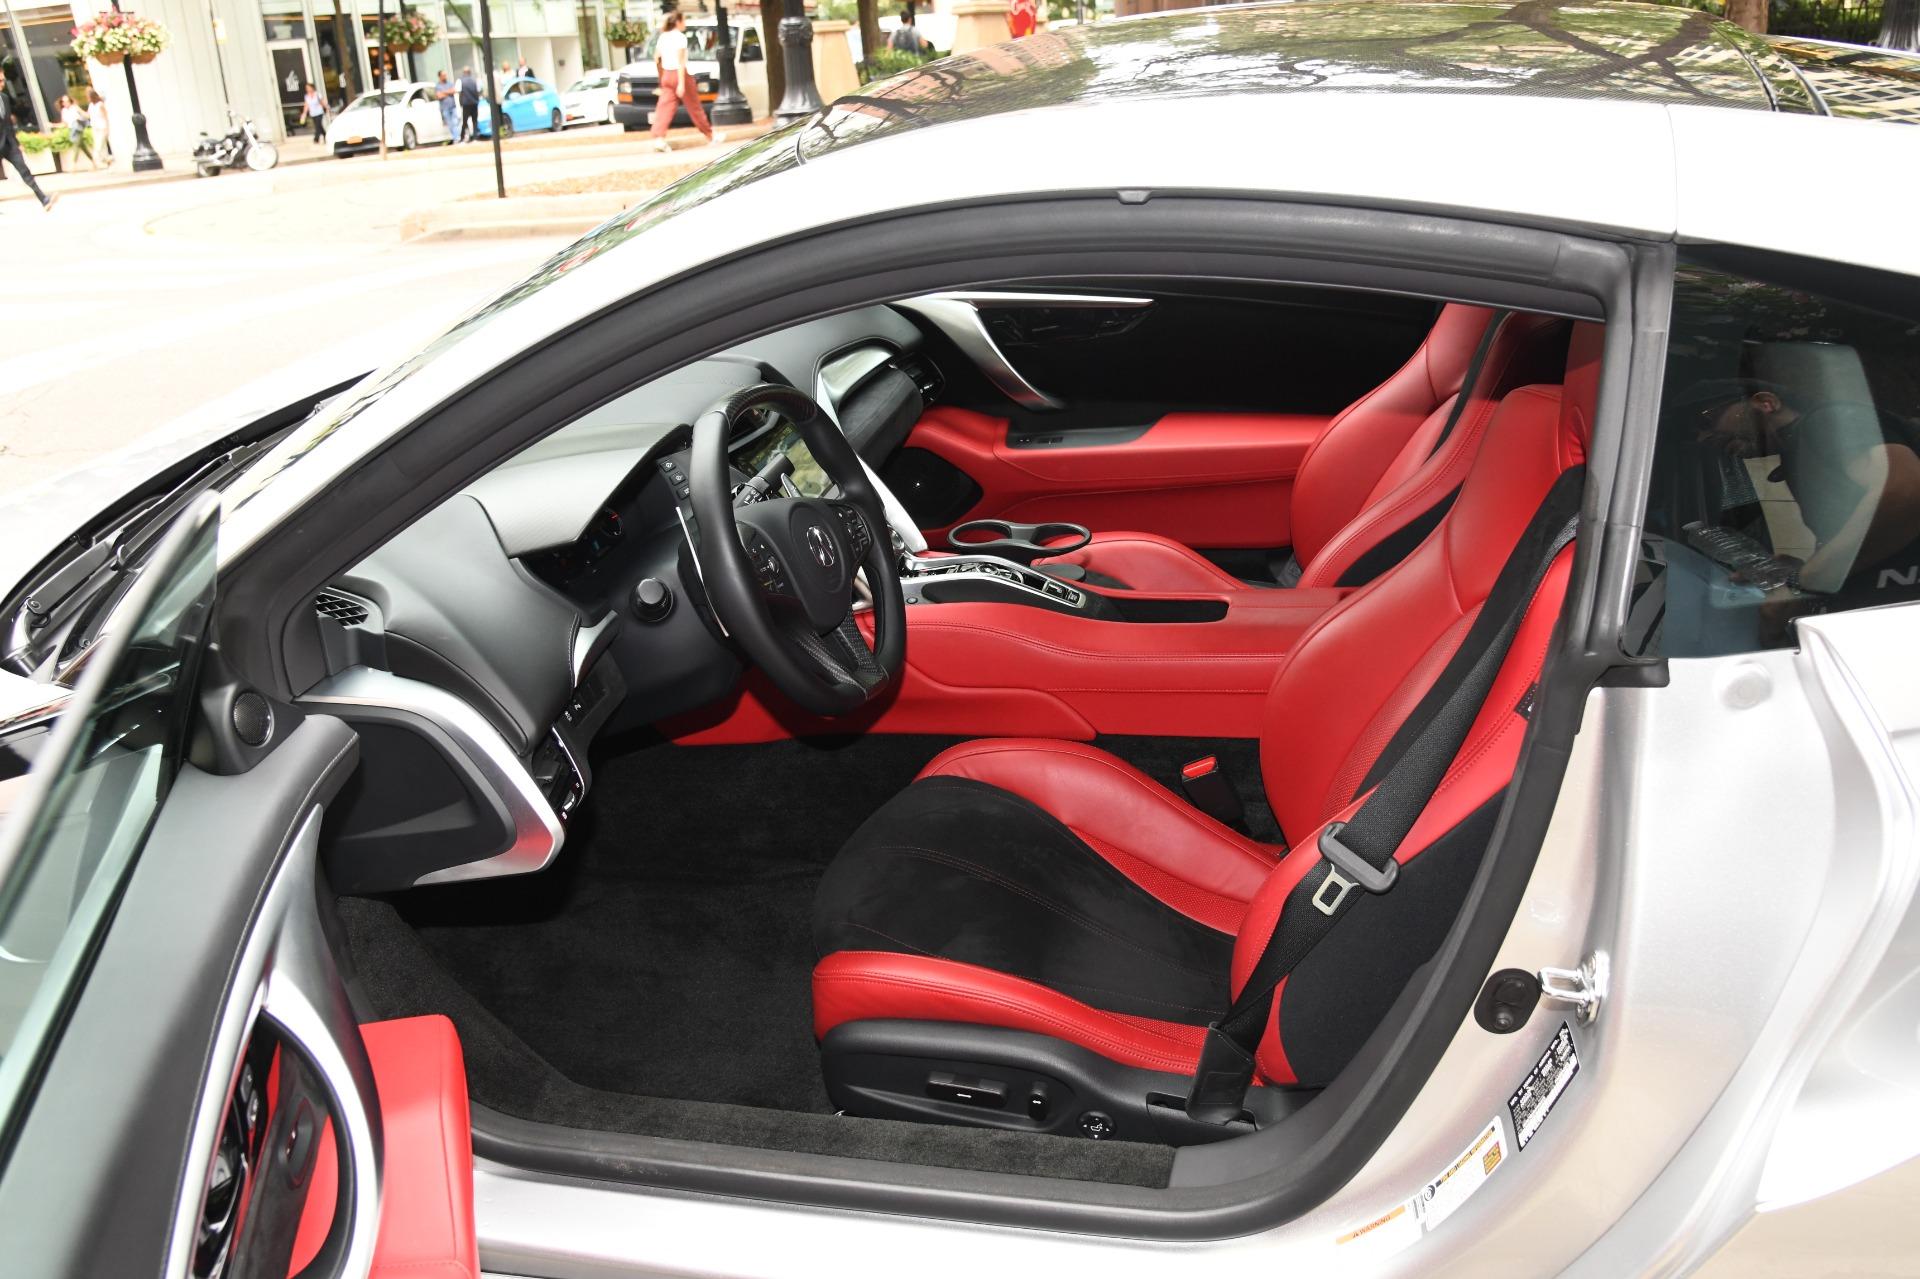 Used 2017 Acura NSX SH-AWD Sport Hybrid   Chicago, IL